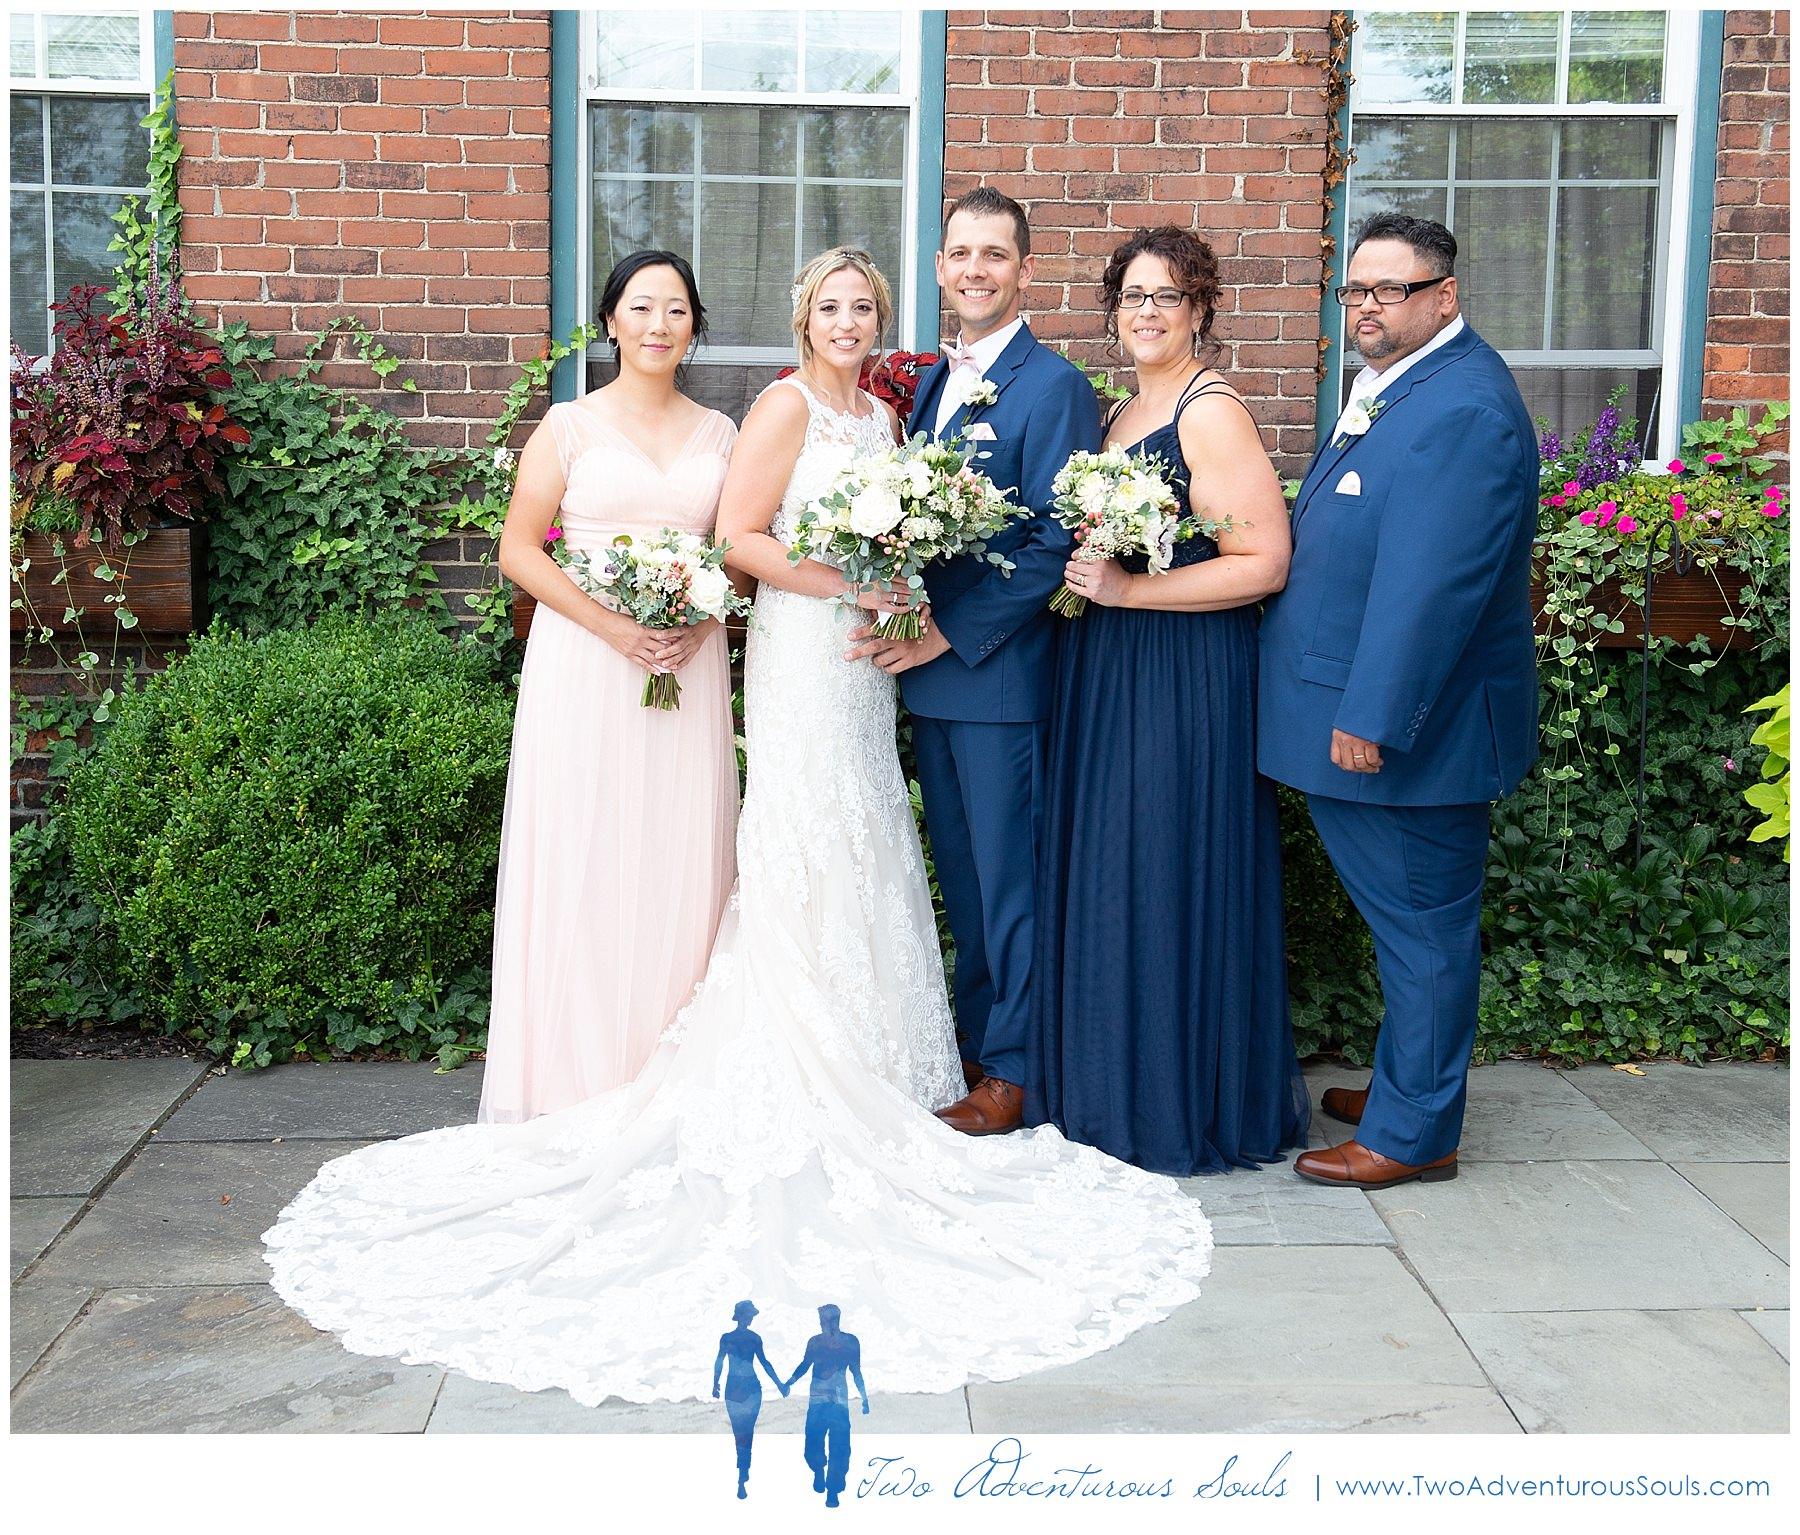 Connecticut Wedding Photographers, Lace Factory Wedding Photographers, Two Adventurous Souls - 083119_0027.jpg